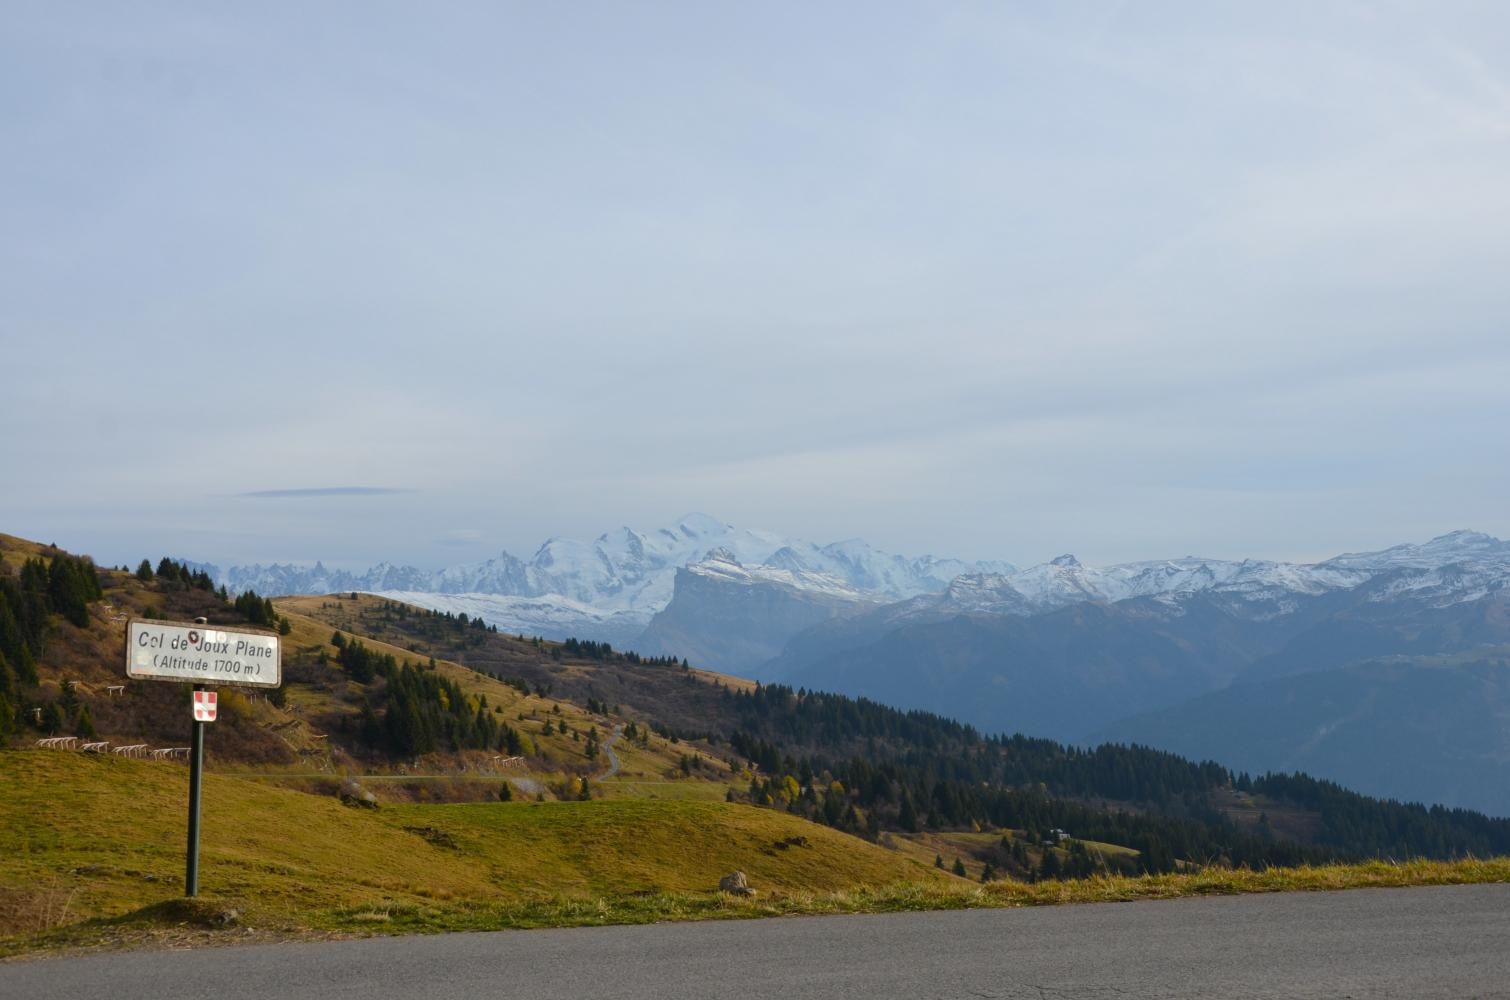 Col de Joux Plane (Morzine) Bike Climb - PJAMM Cycling